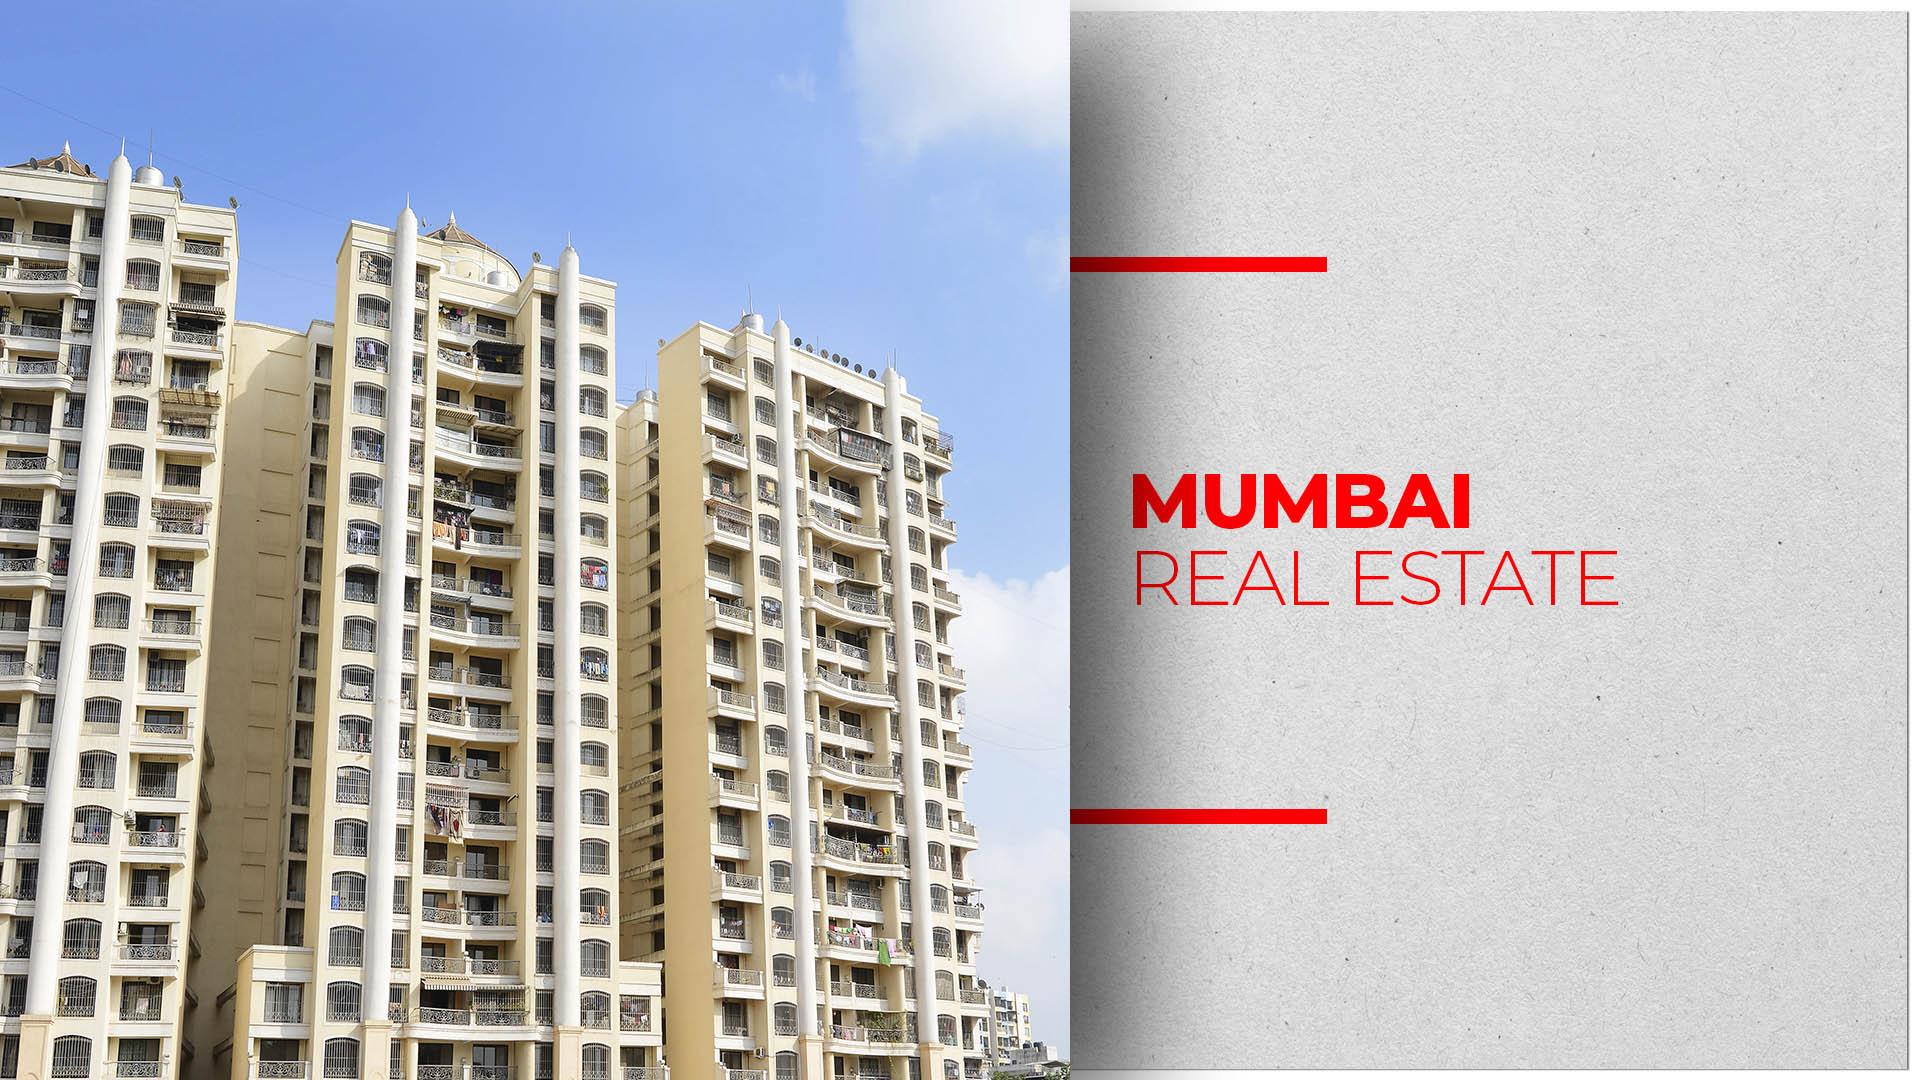 Getting 'Real' About Mumbai Real Estat